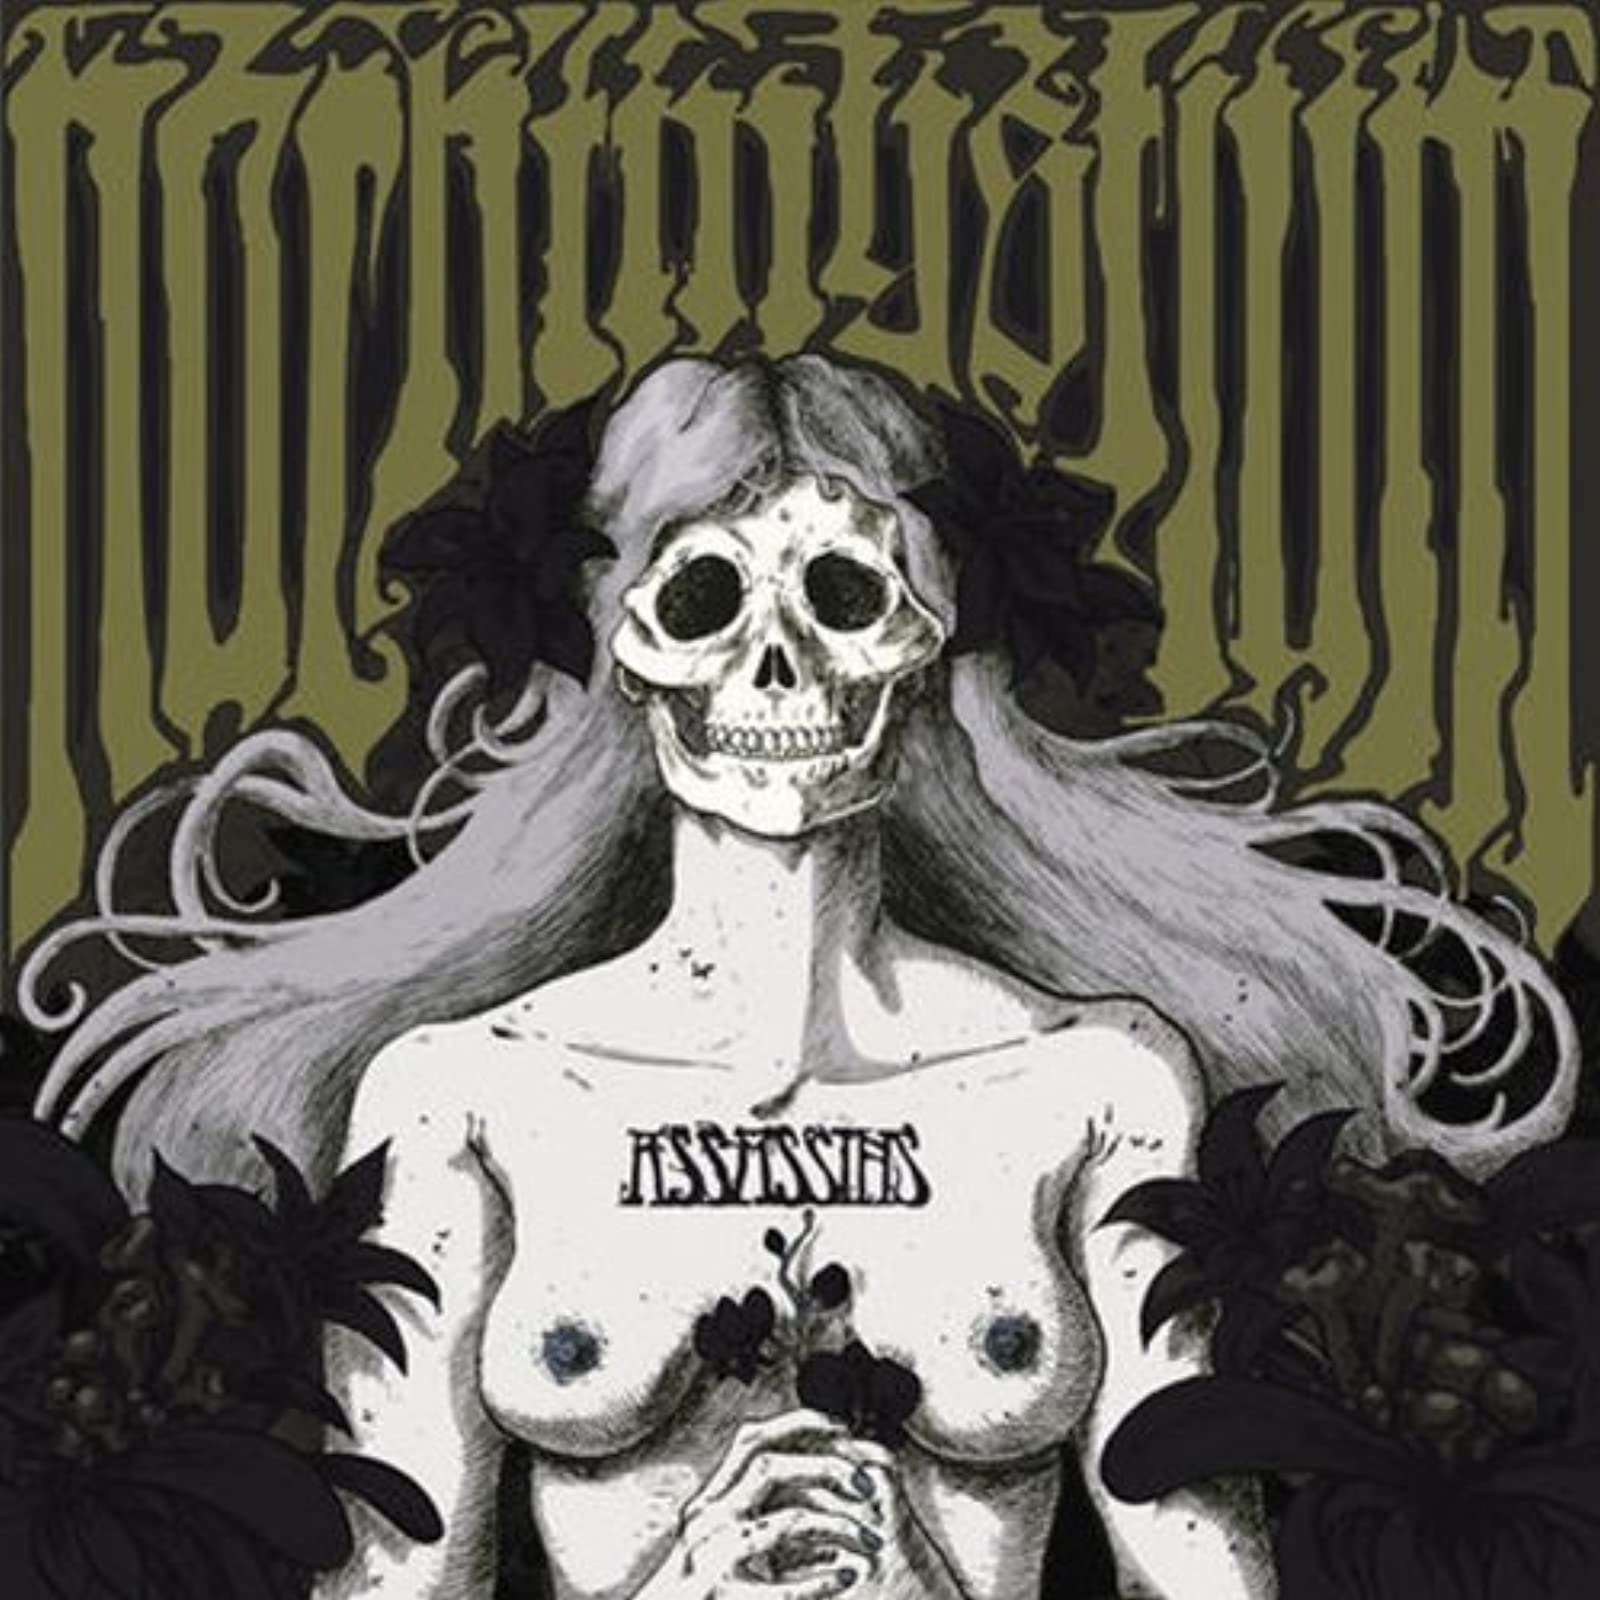 Assassins: Black Meddle Pt 1 Lp By Nachtmystium On Vinyl Record